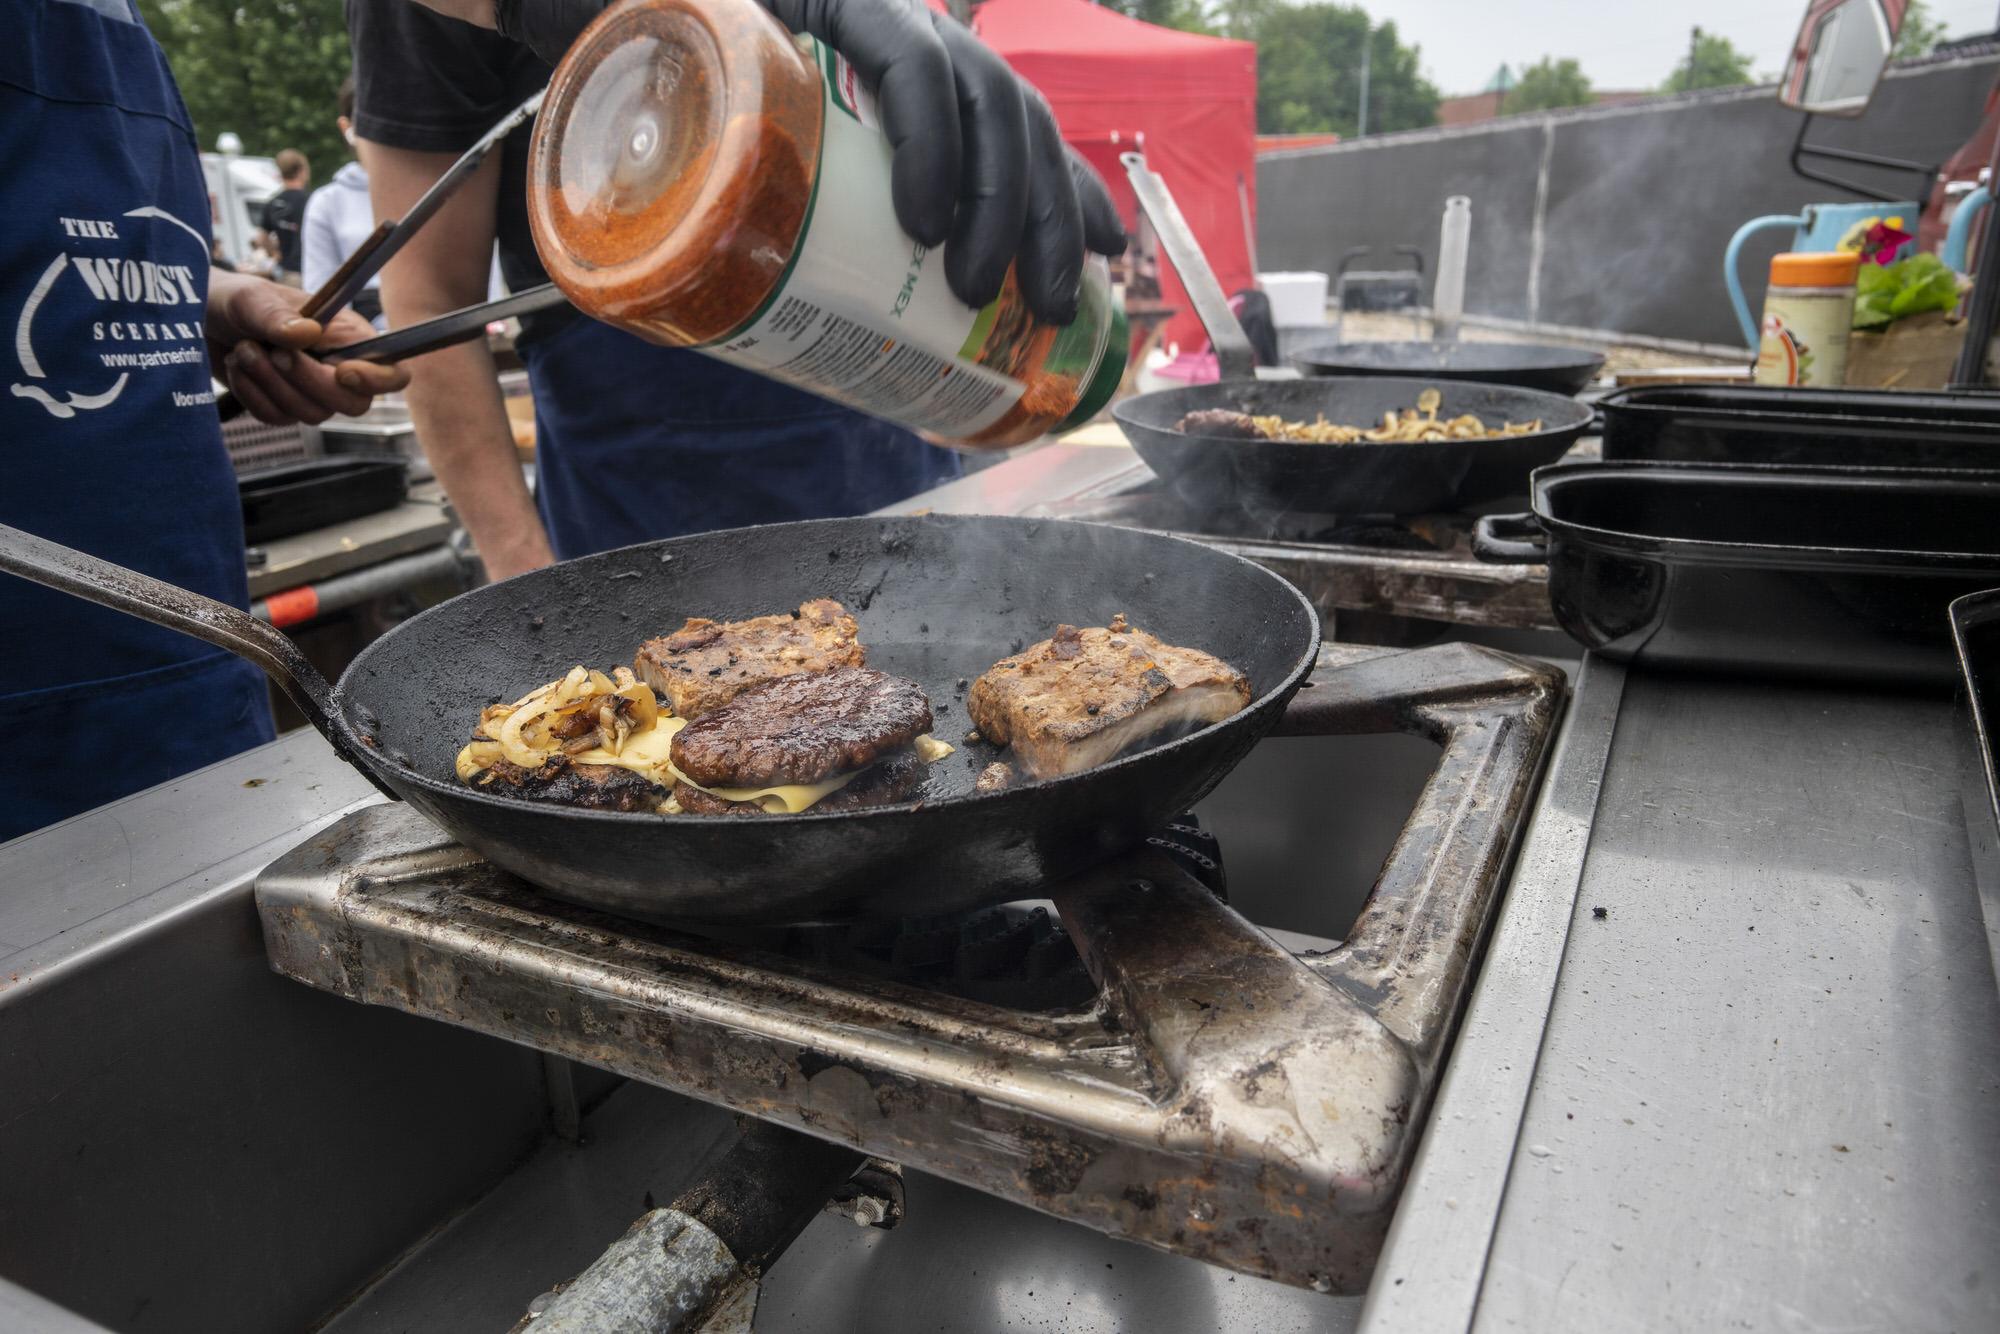 SPIJS-foodfestival-5juni21-00065.jpg